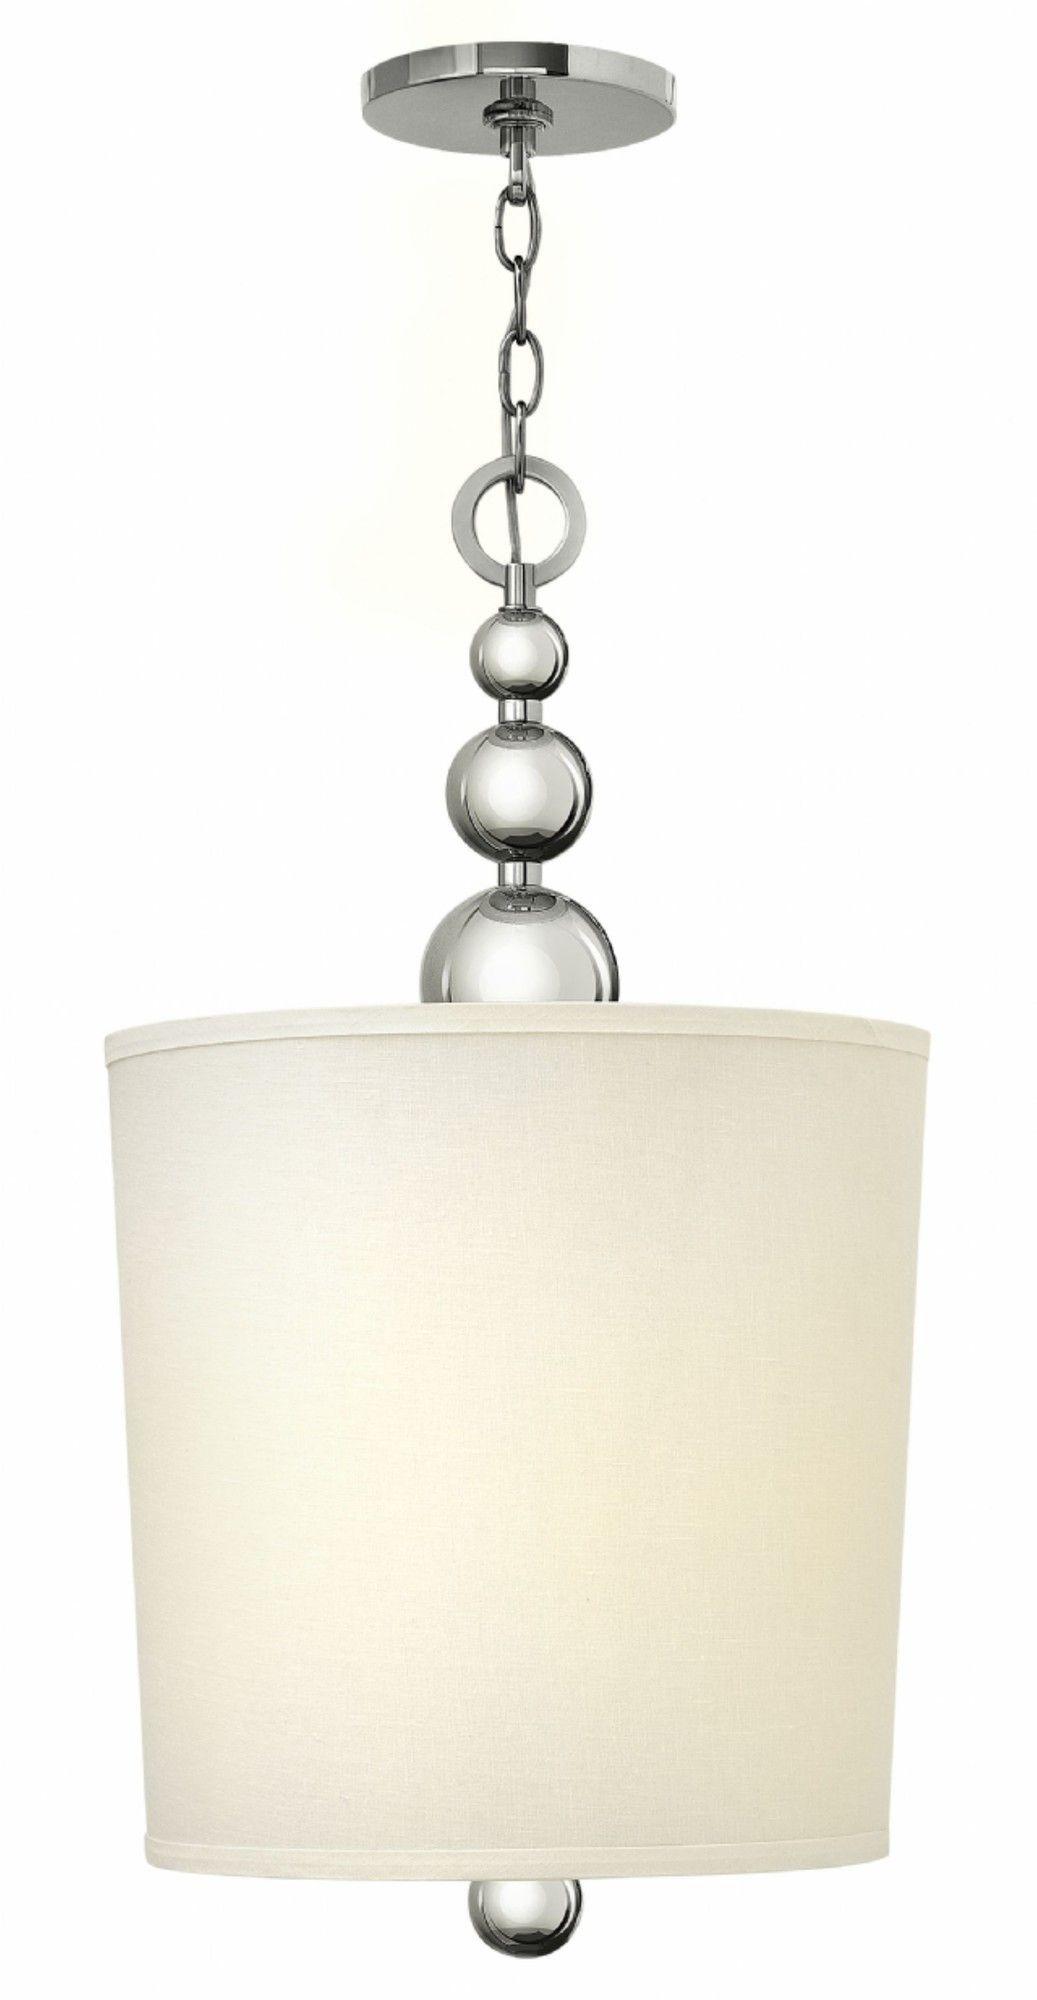 Goulet 4 Light Drum Pendant